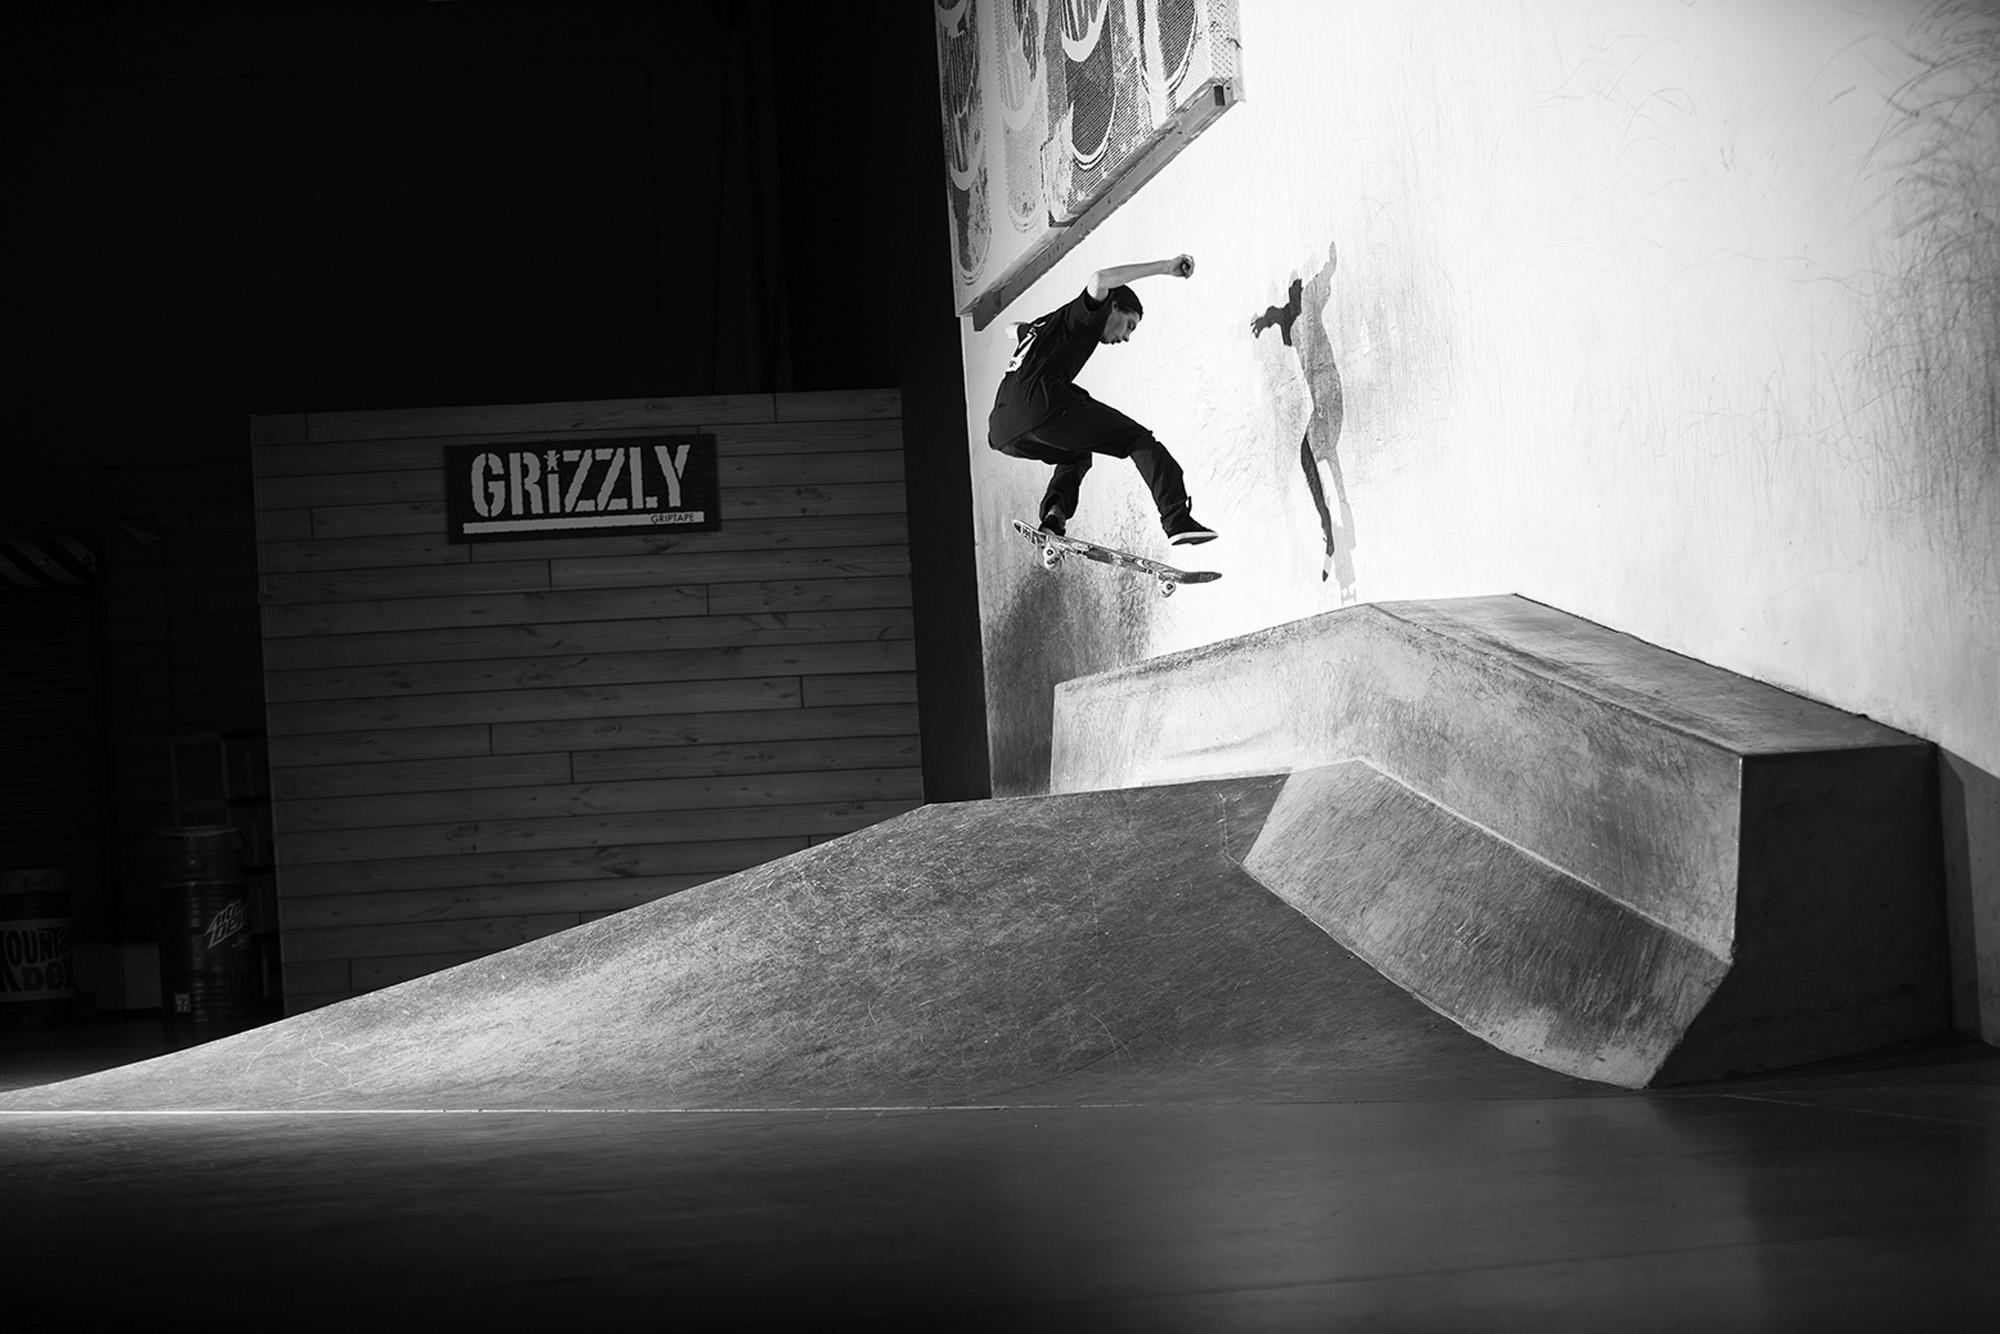 Tyson Bowerbank Almost Skateboards - The Berrics Recruit 3